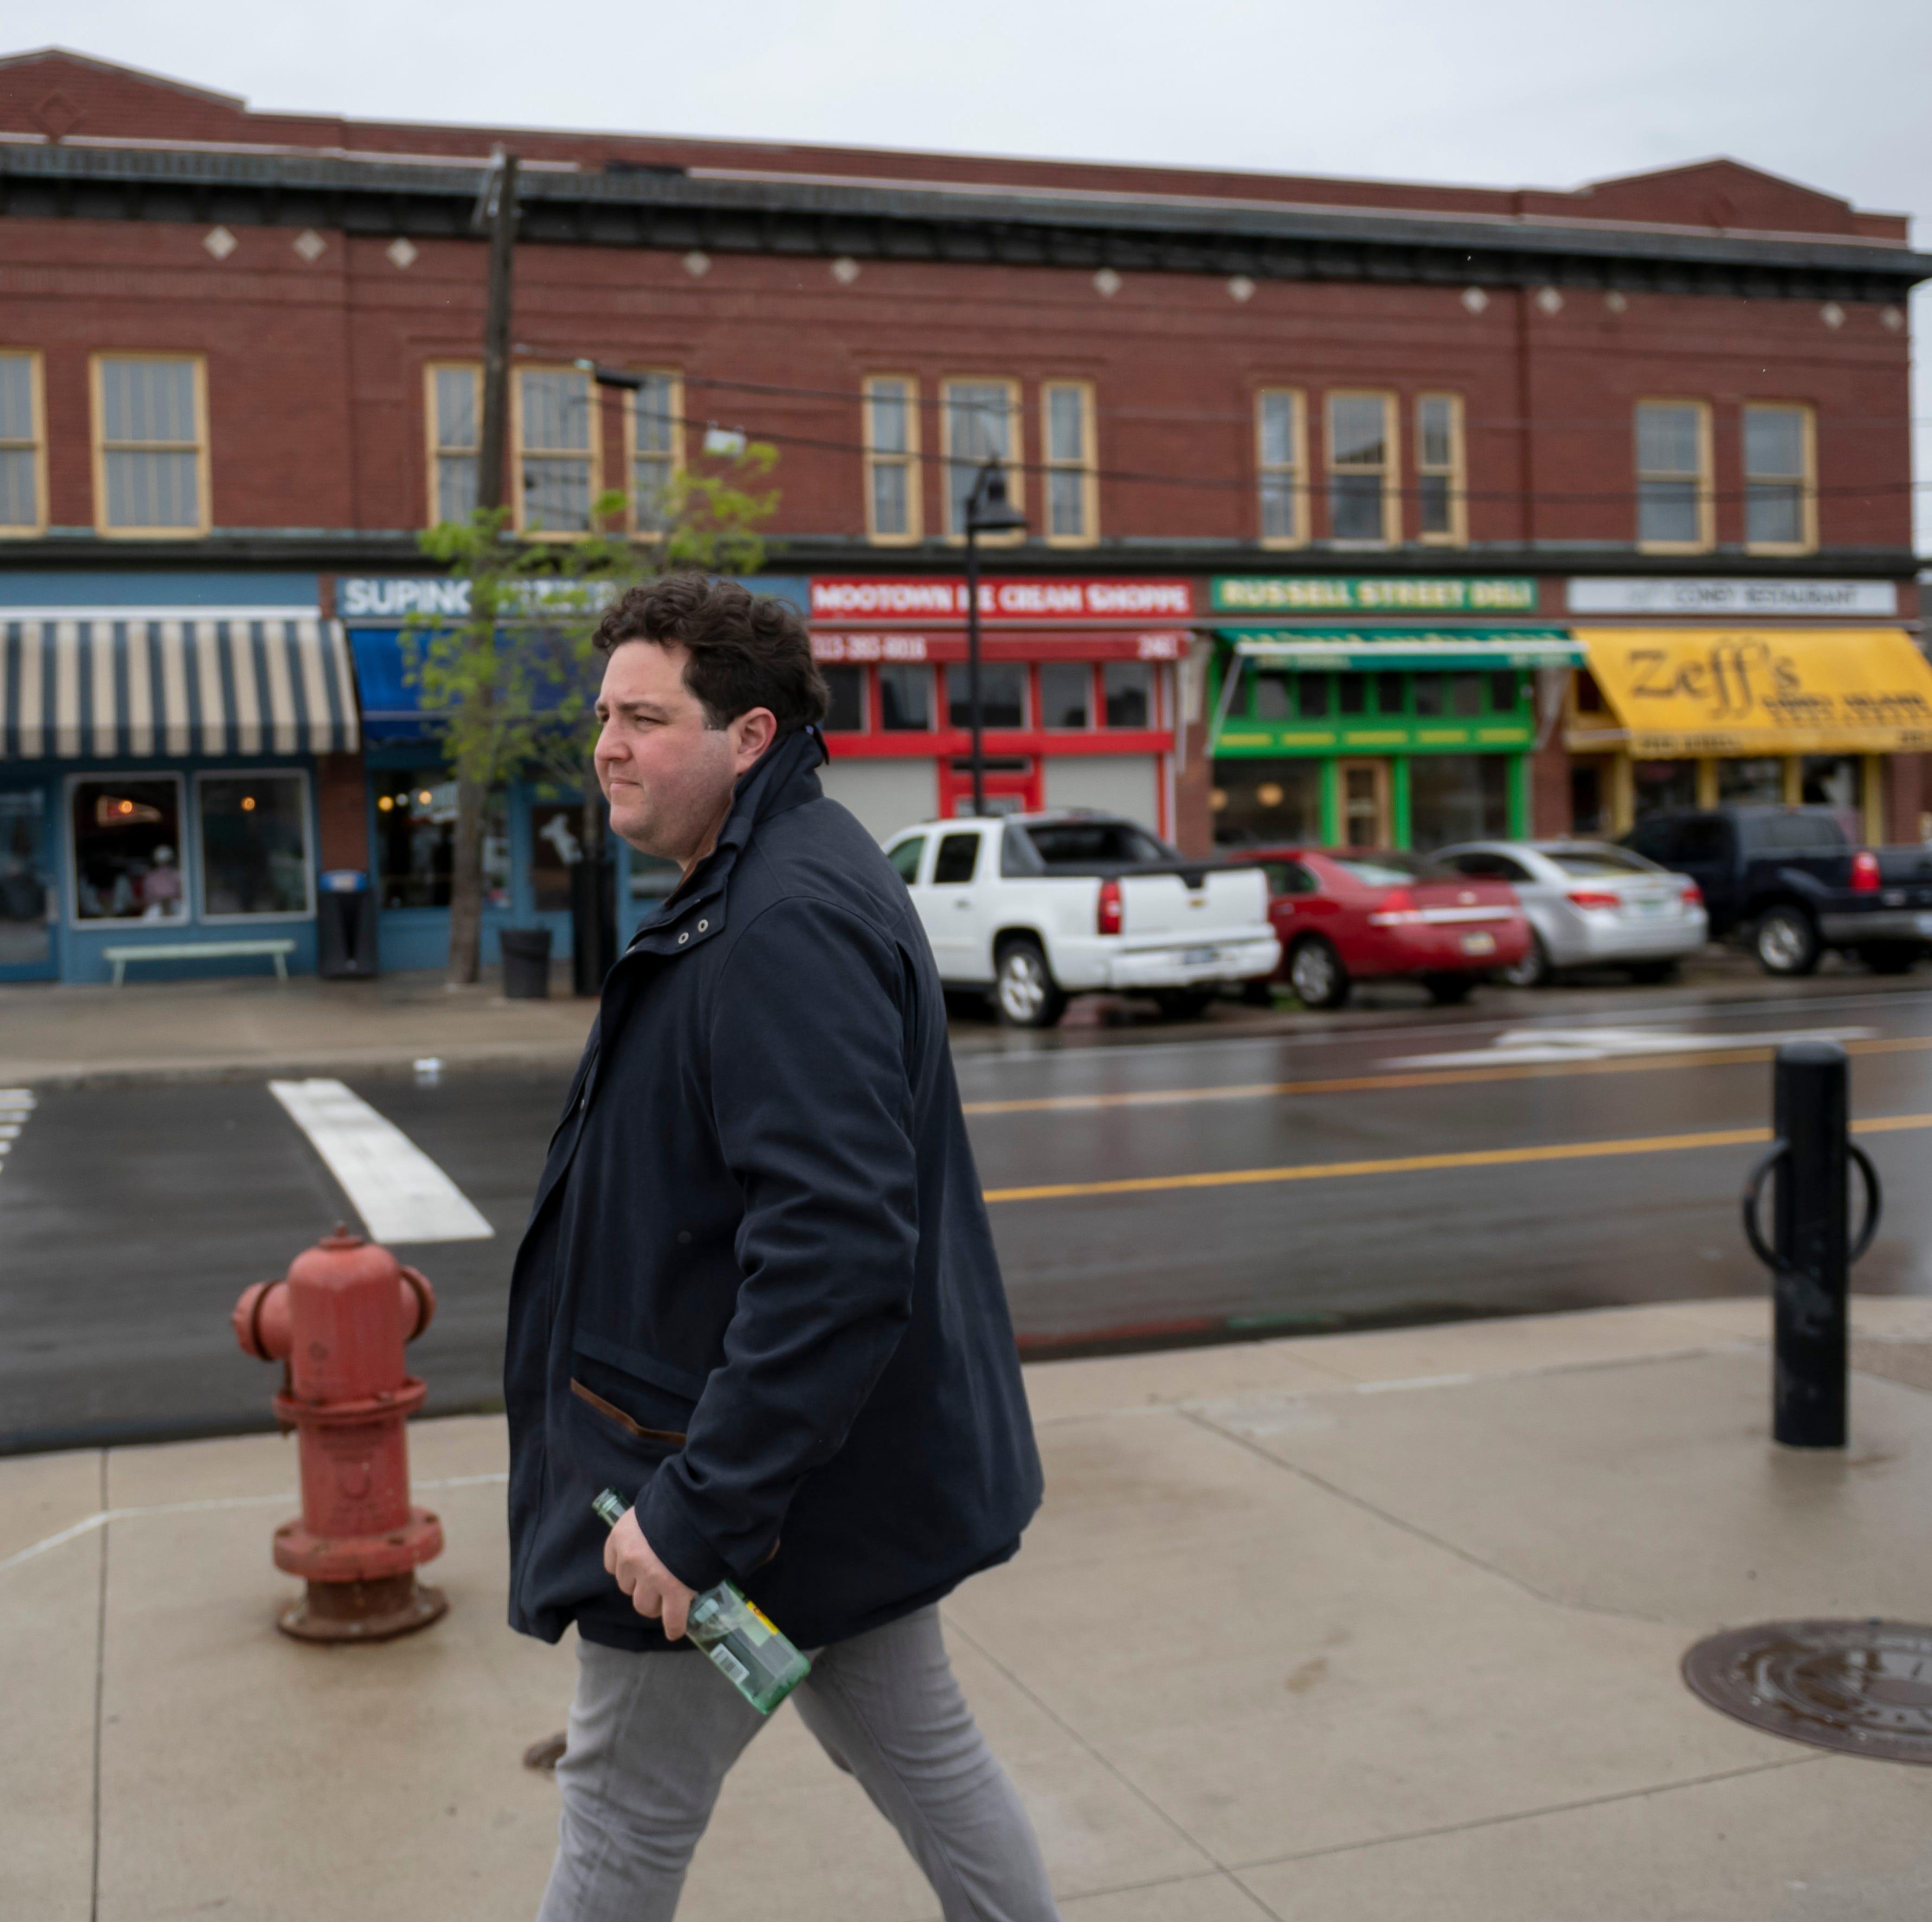 Eastern Market entrepreneur Sanford Nelson insists he's not area's villain